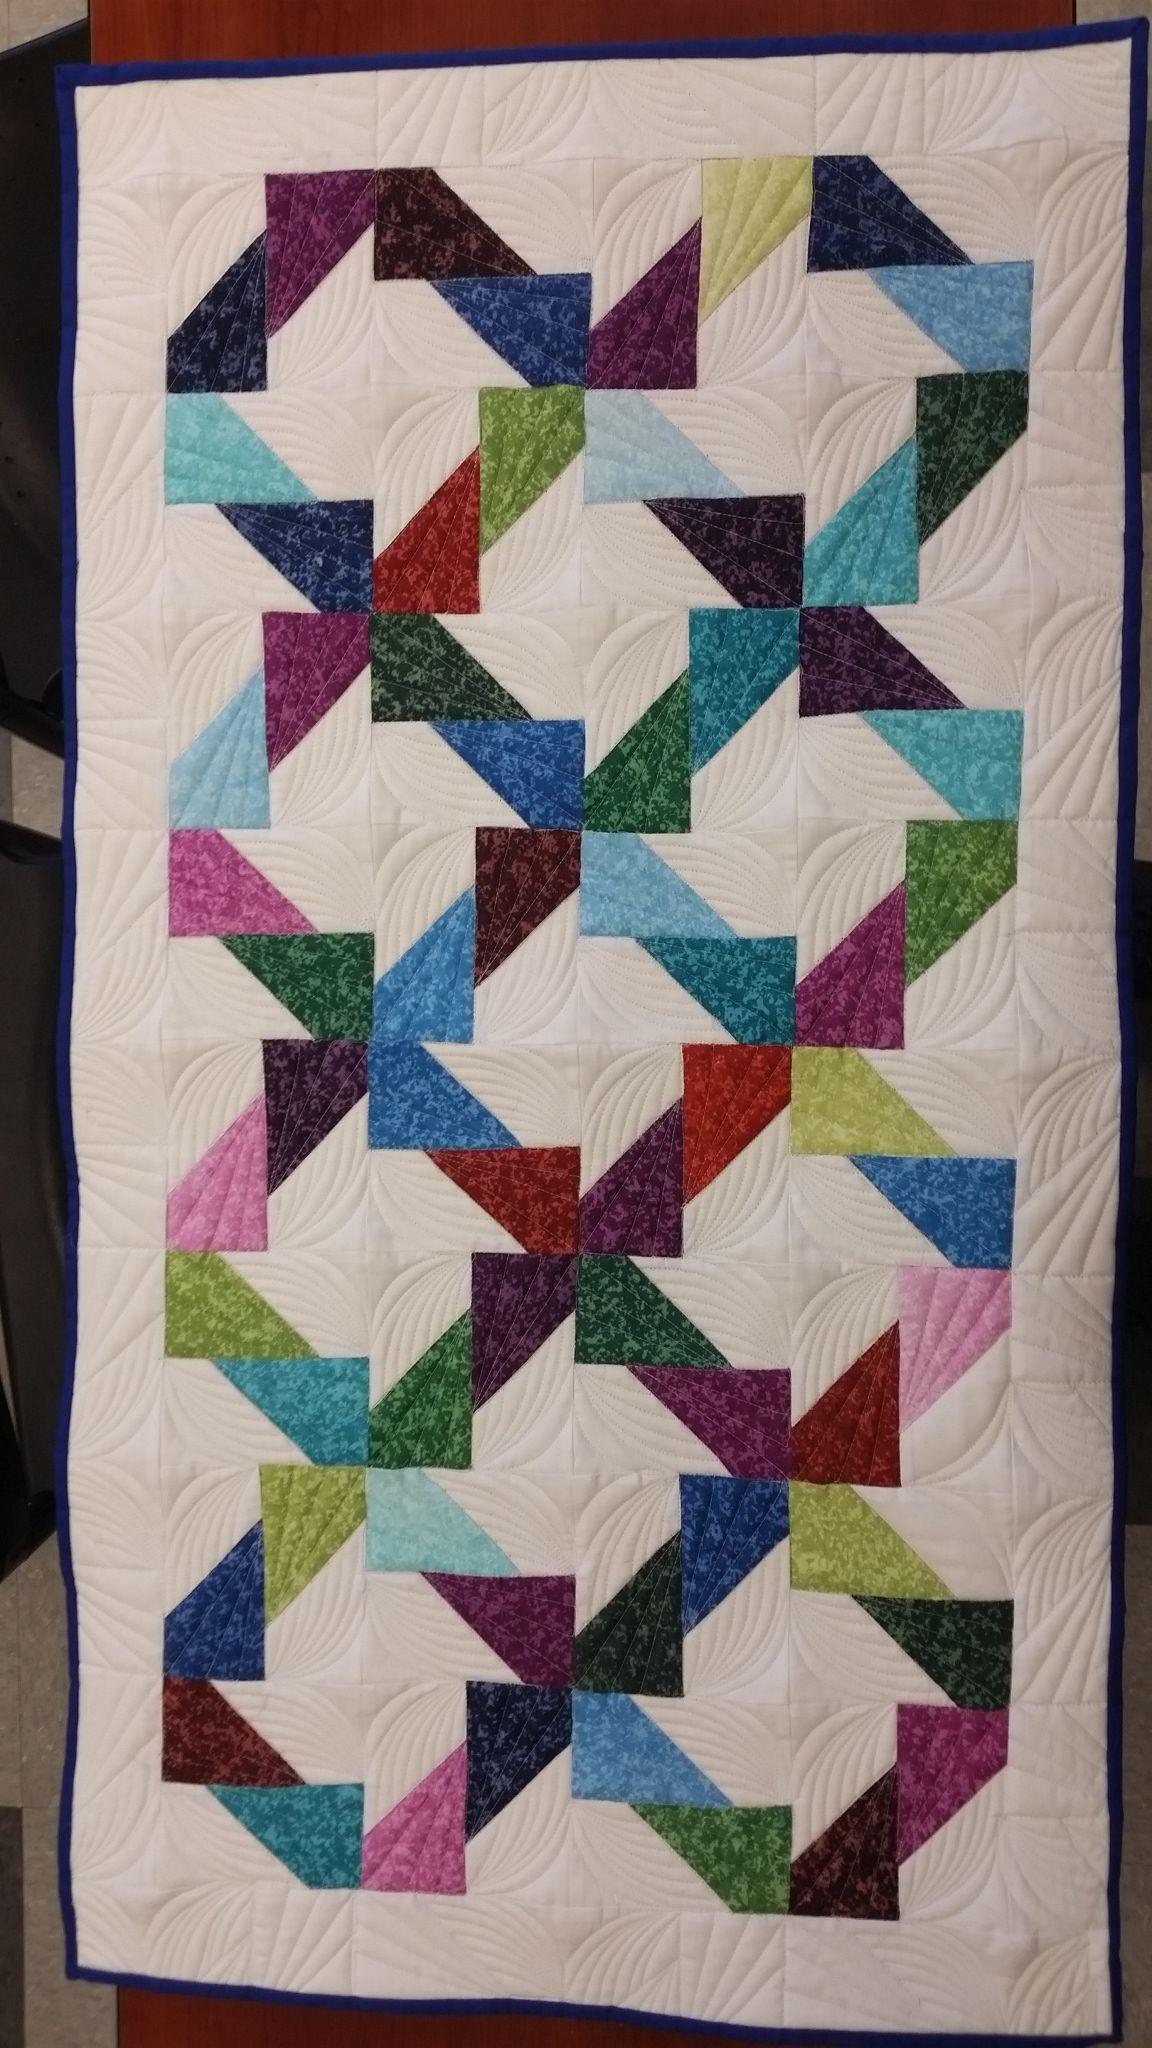 Crochet Patterns Modern Photo Only Love The